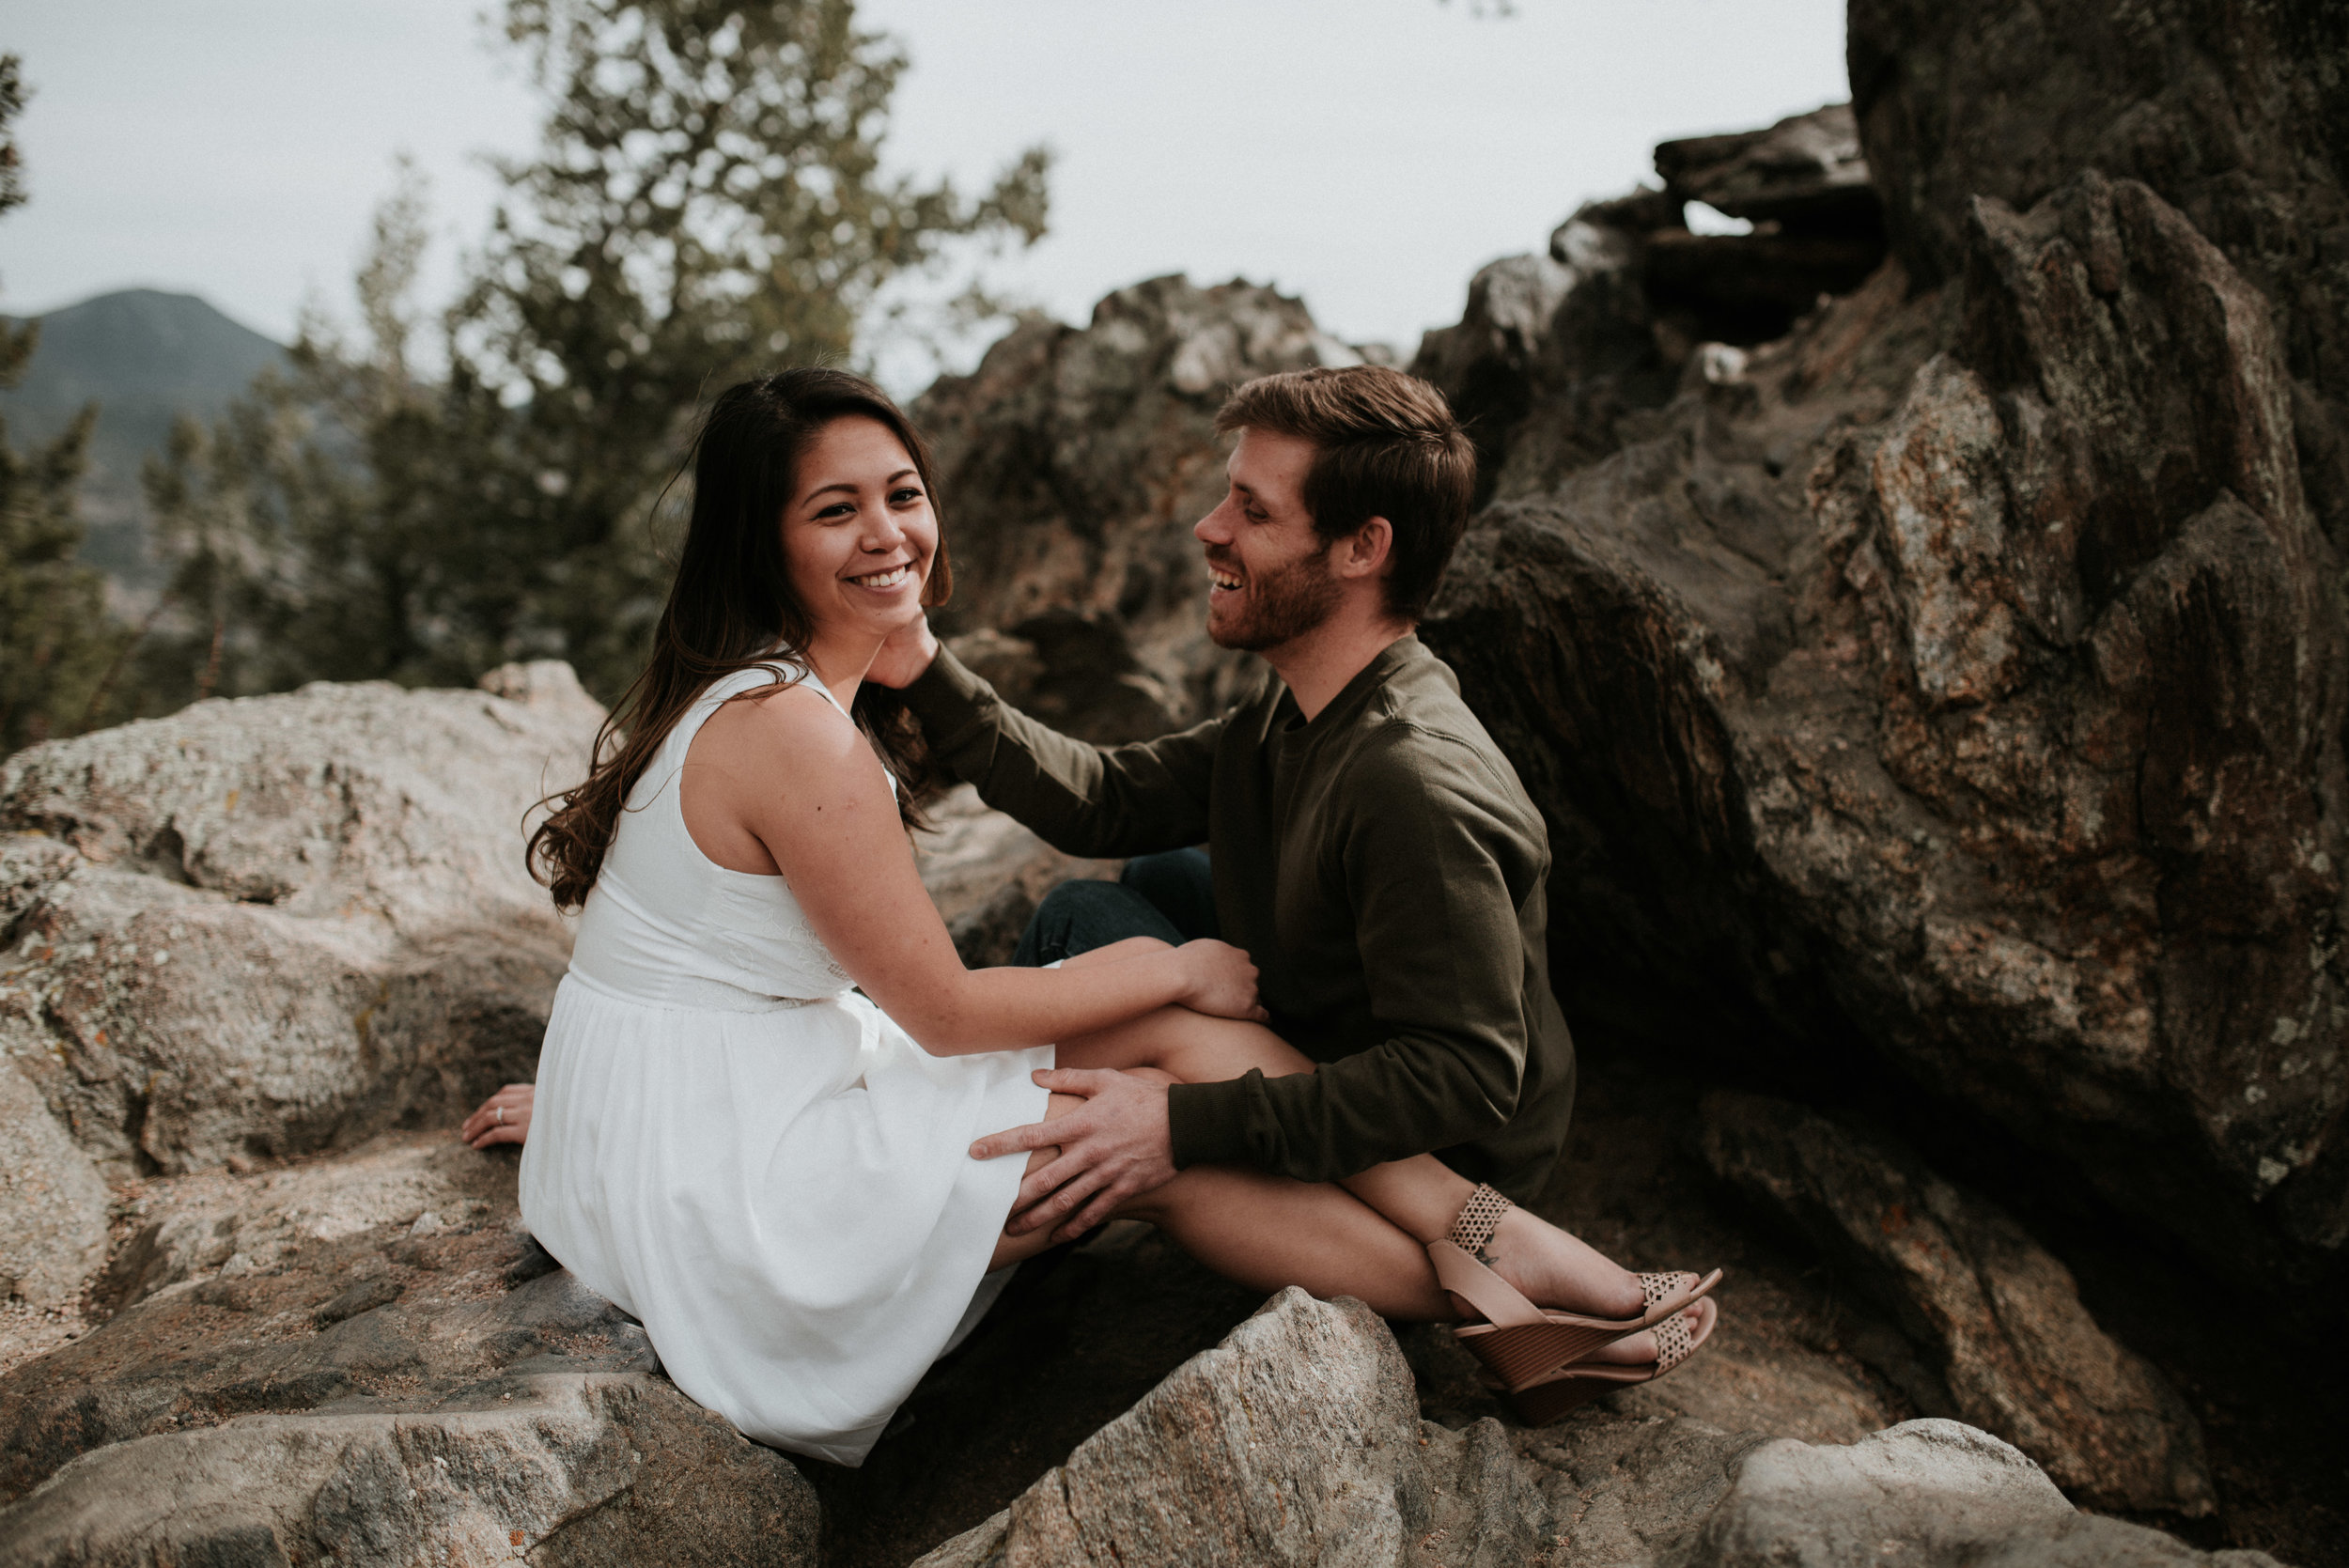 Zach&Rosalie Rocky Mountain National Park Engagement Denver Colorado Rocky Mountain Wedding Photographer00026.jpg